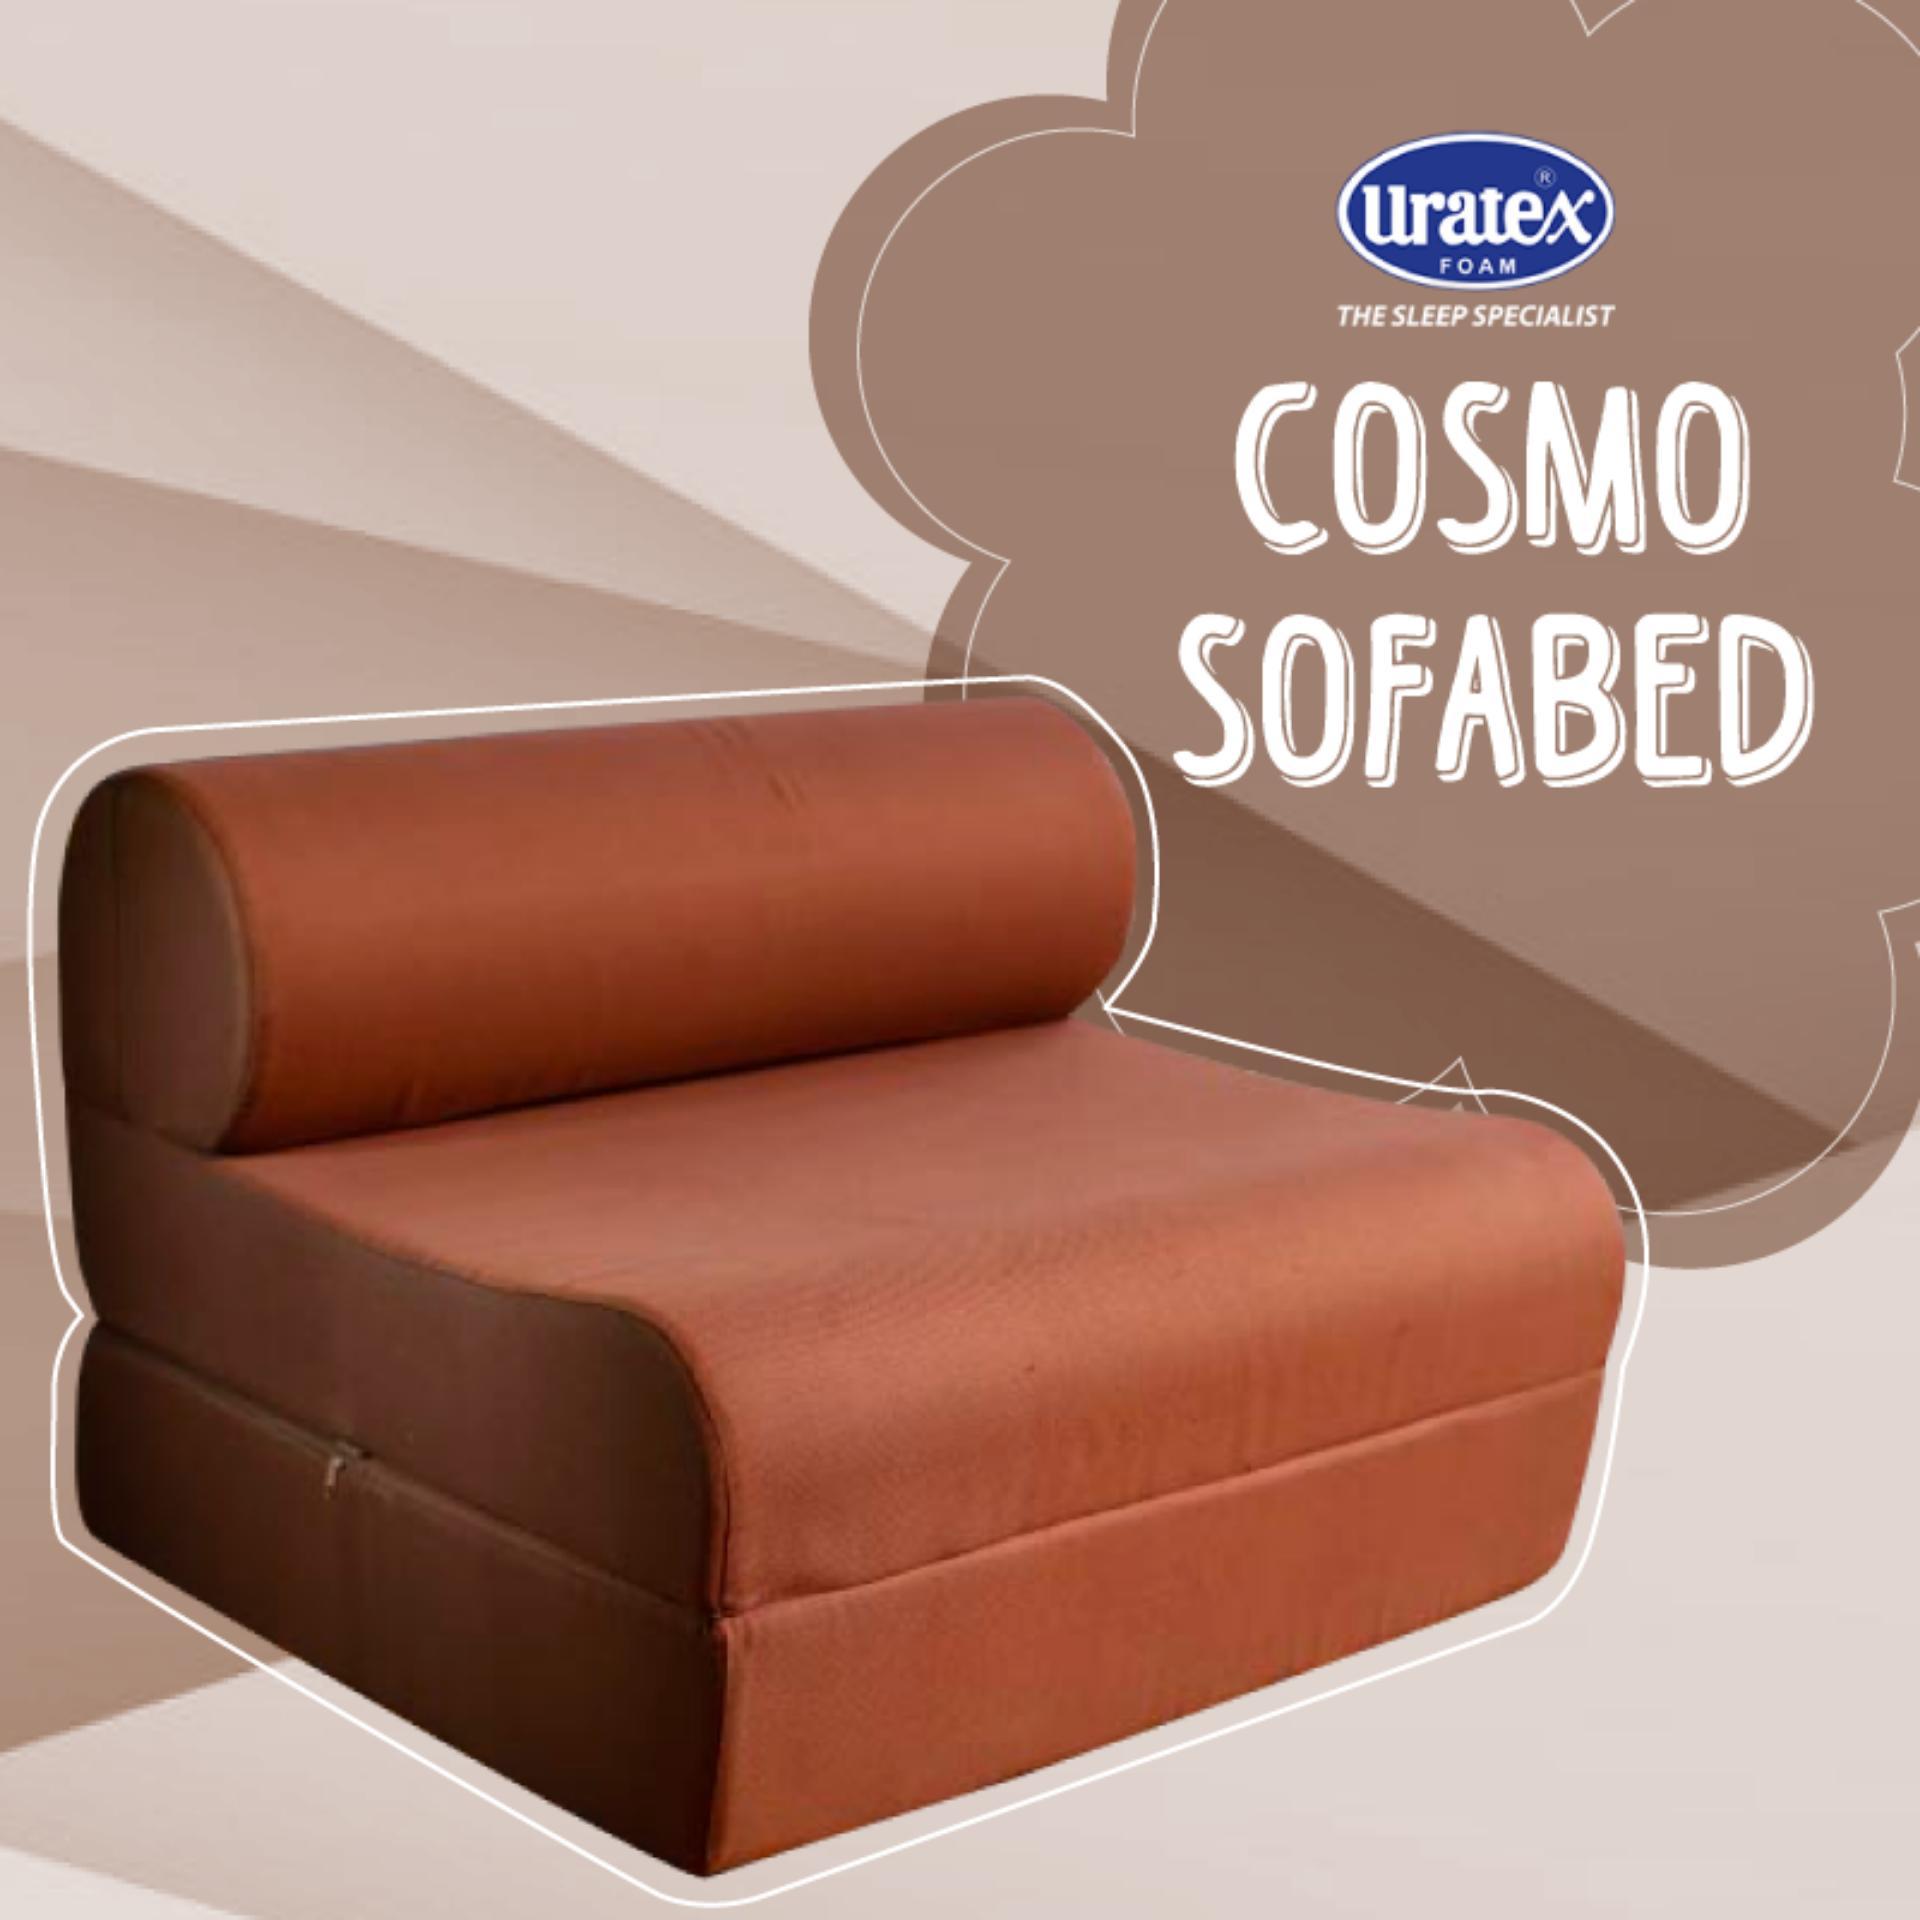 cosmo sofa bed 7.5x36x75 brown | lazada ph